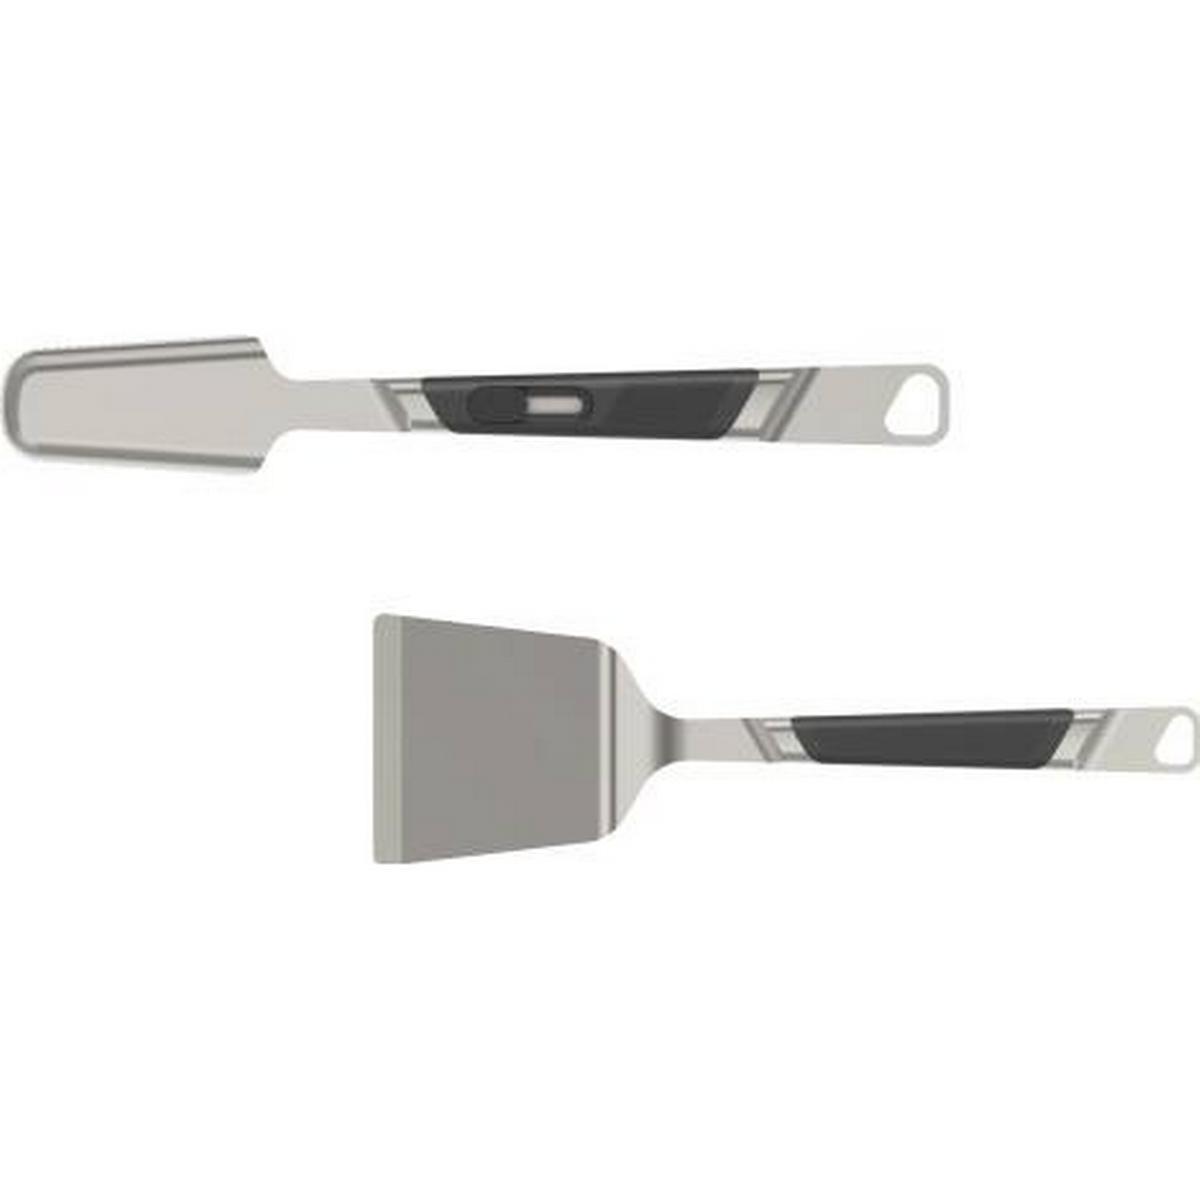 Grillverktyg • Hitta det lägsta priset hos PriceRunner nu »